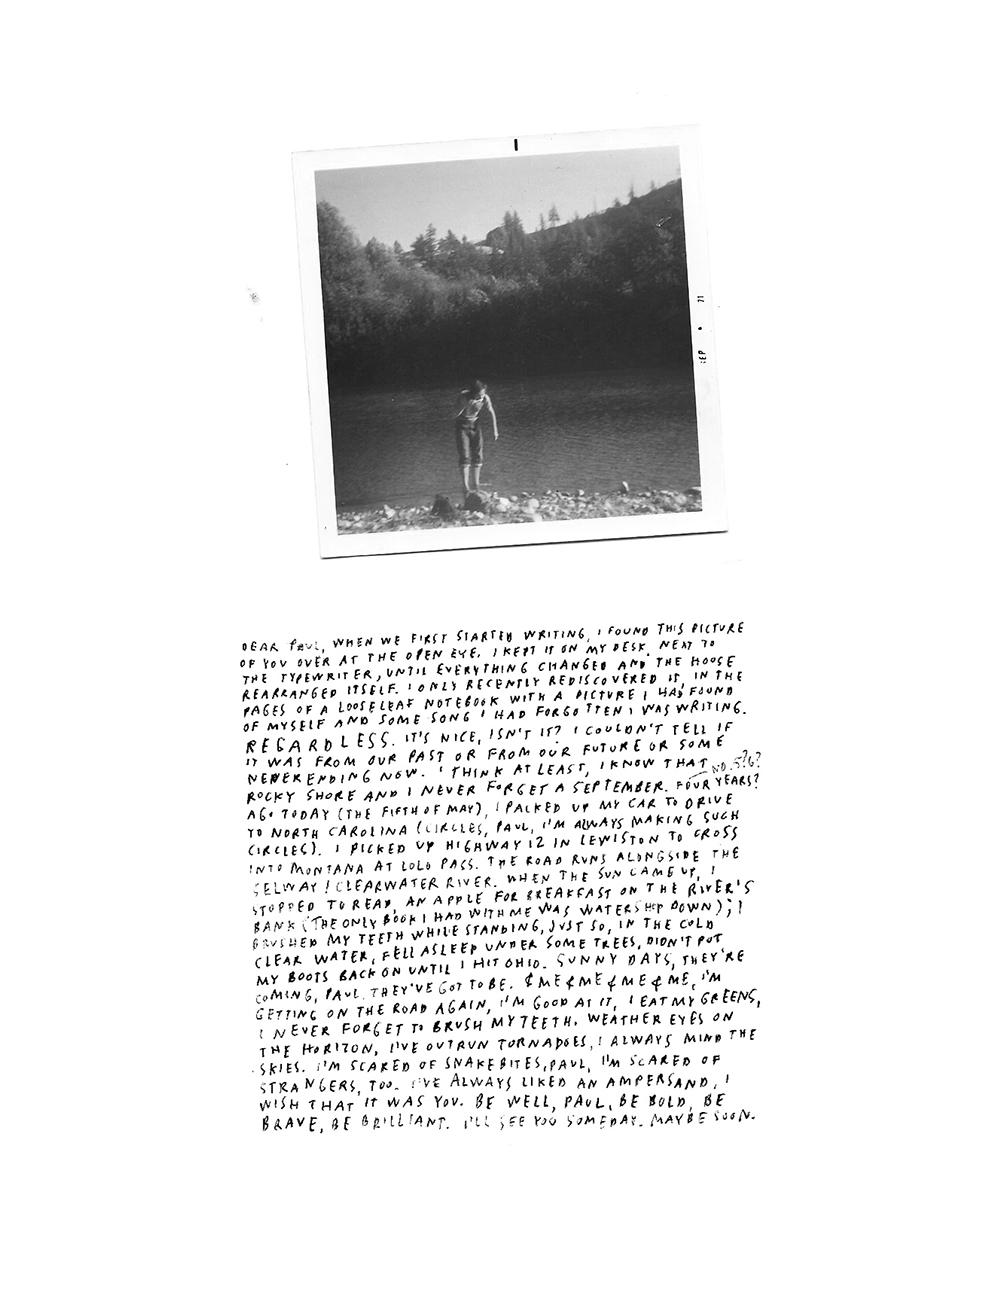 Rothlisberger_1932Edgewood_02.jpg